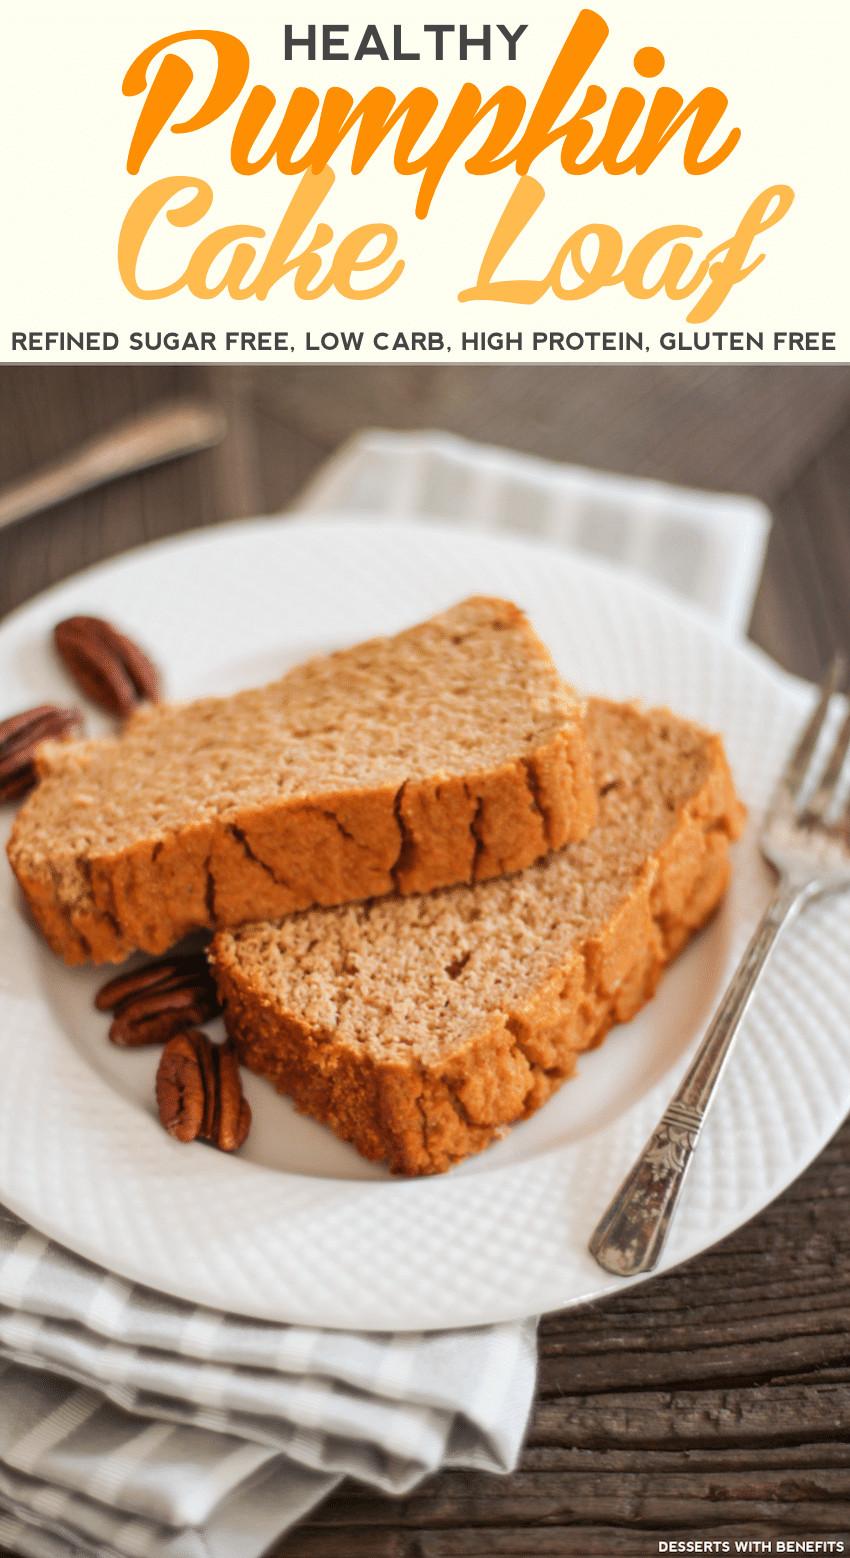 Sugar Free Dairy Free Desserts  Desserts With Benefits Healthy Pumpkin Cake Loaf recipe